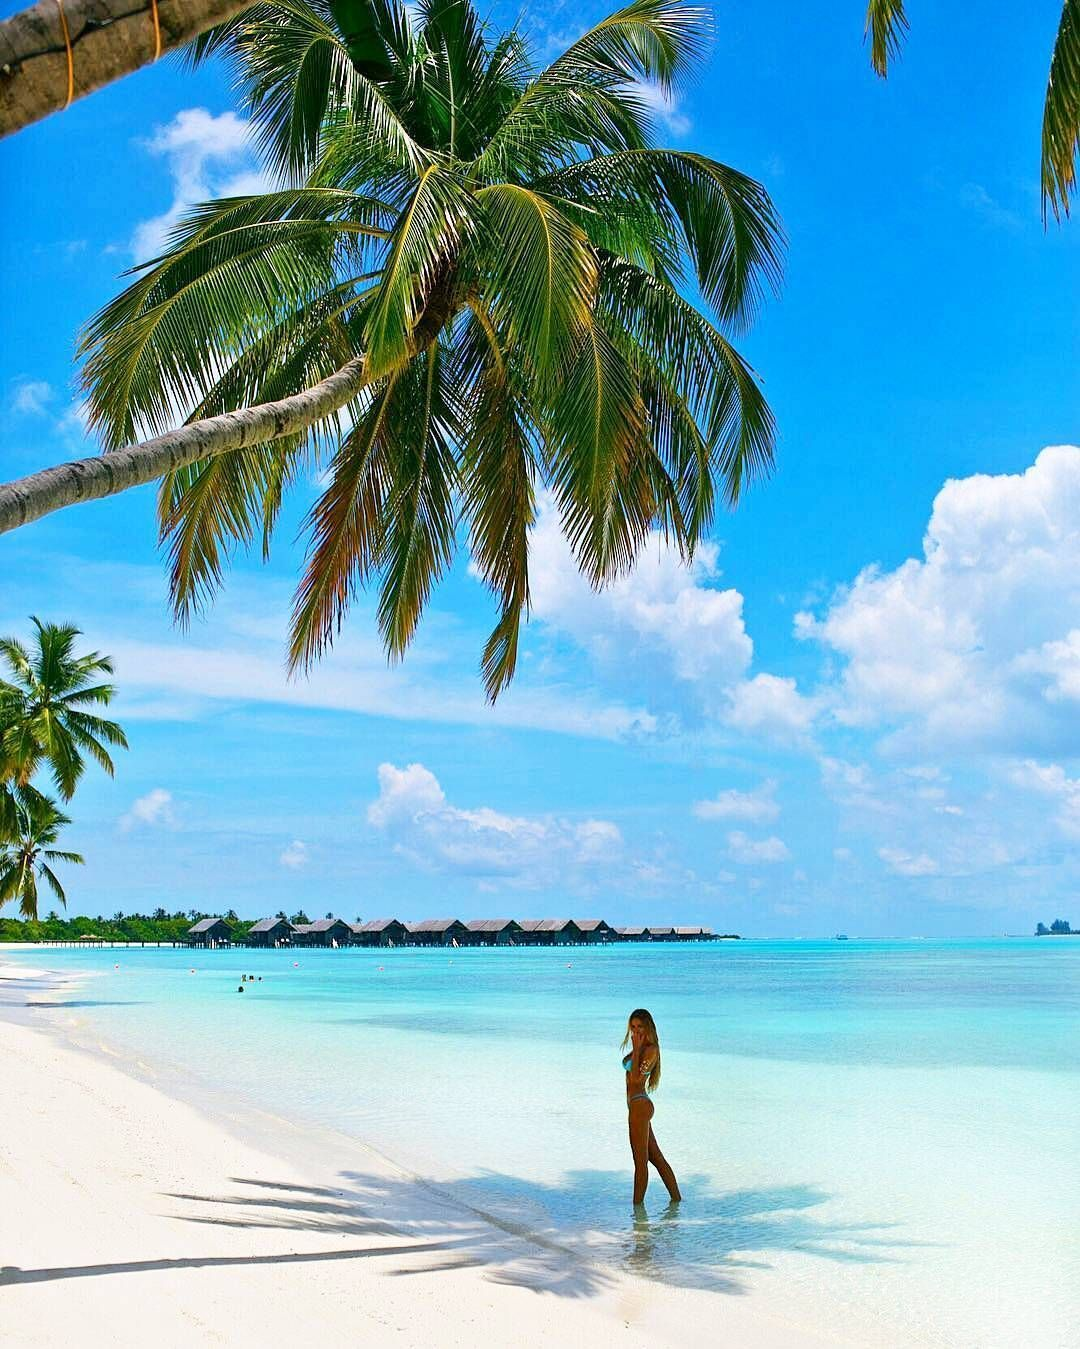 Island Beach Scenes: Maldives Island, Beach Photography, Photo